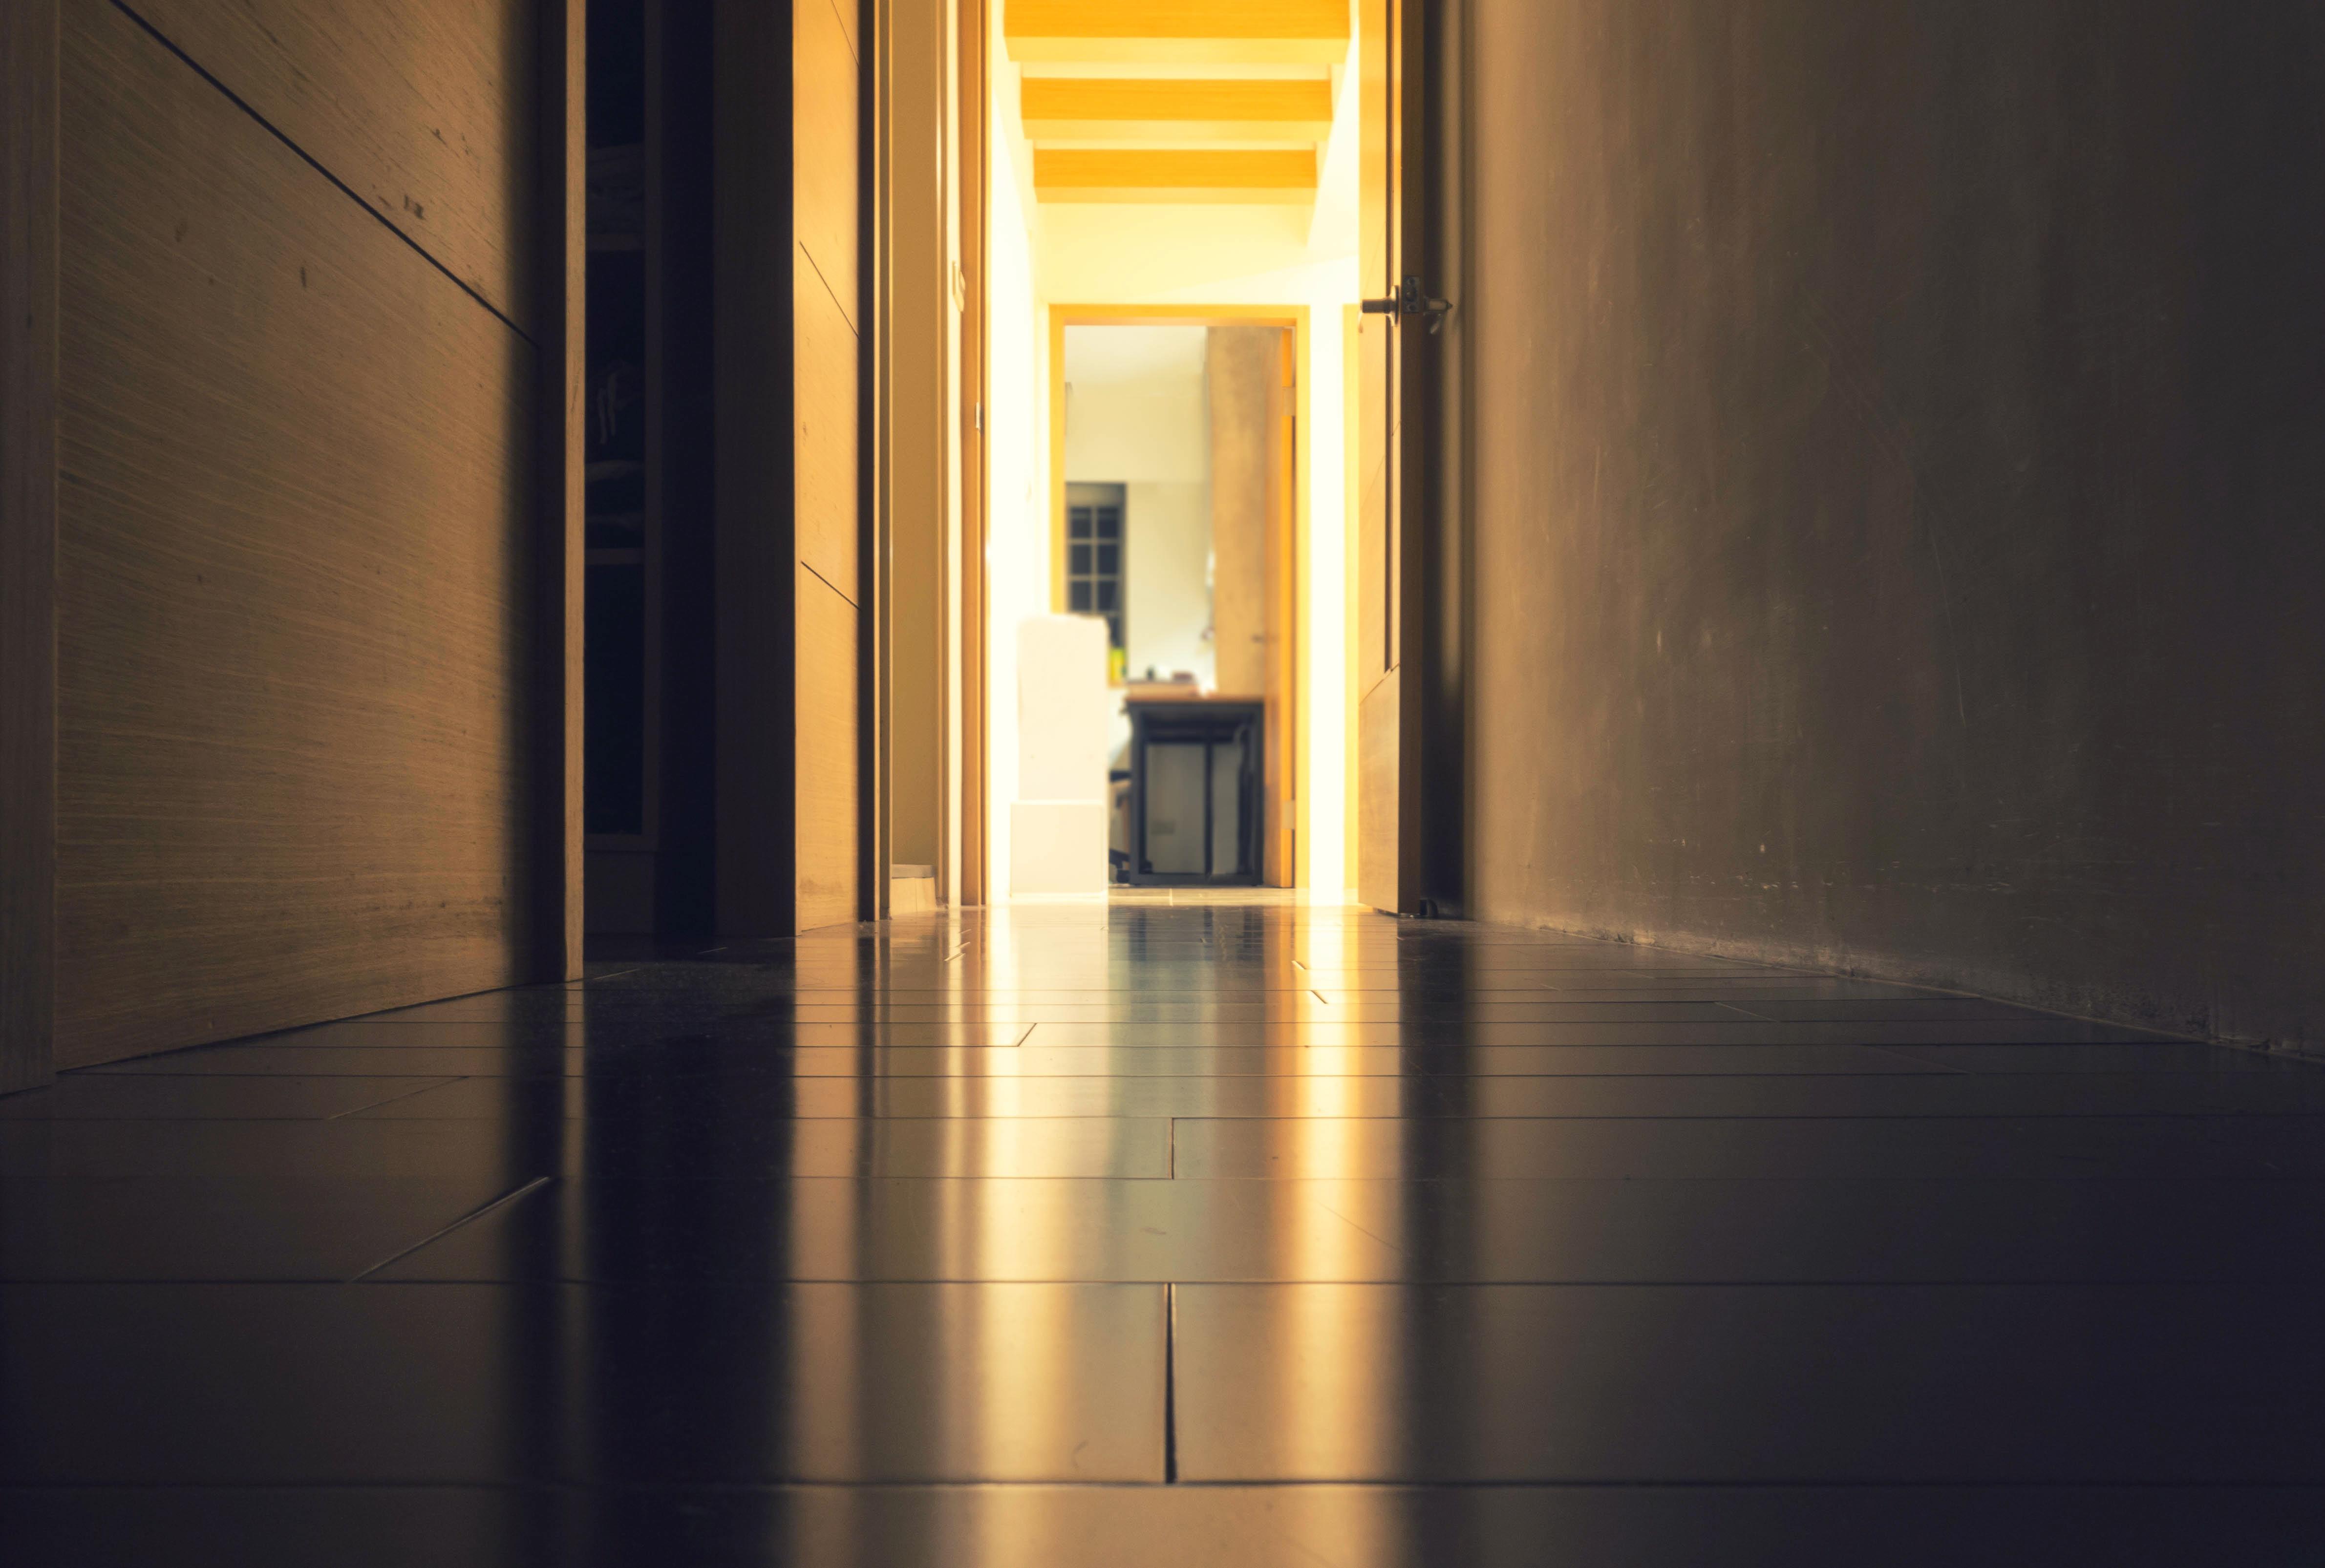 Corridor Design Color: Free Images : Light, Architecture, Wood, Sunlight, Floor